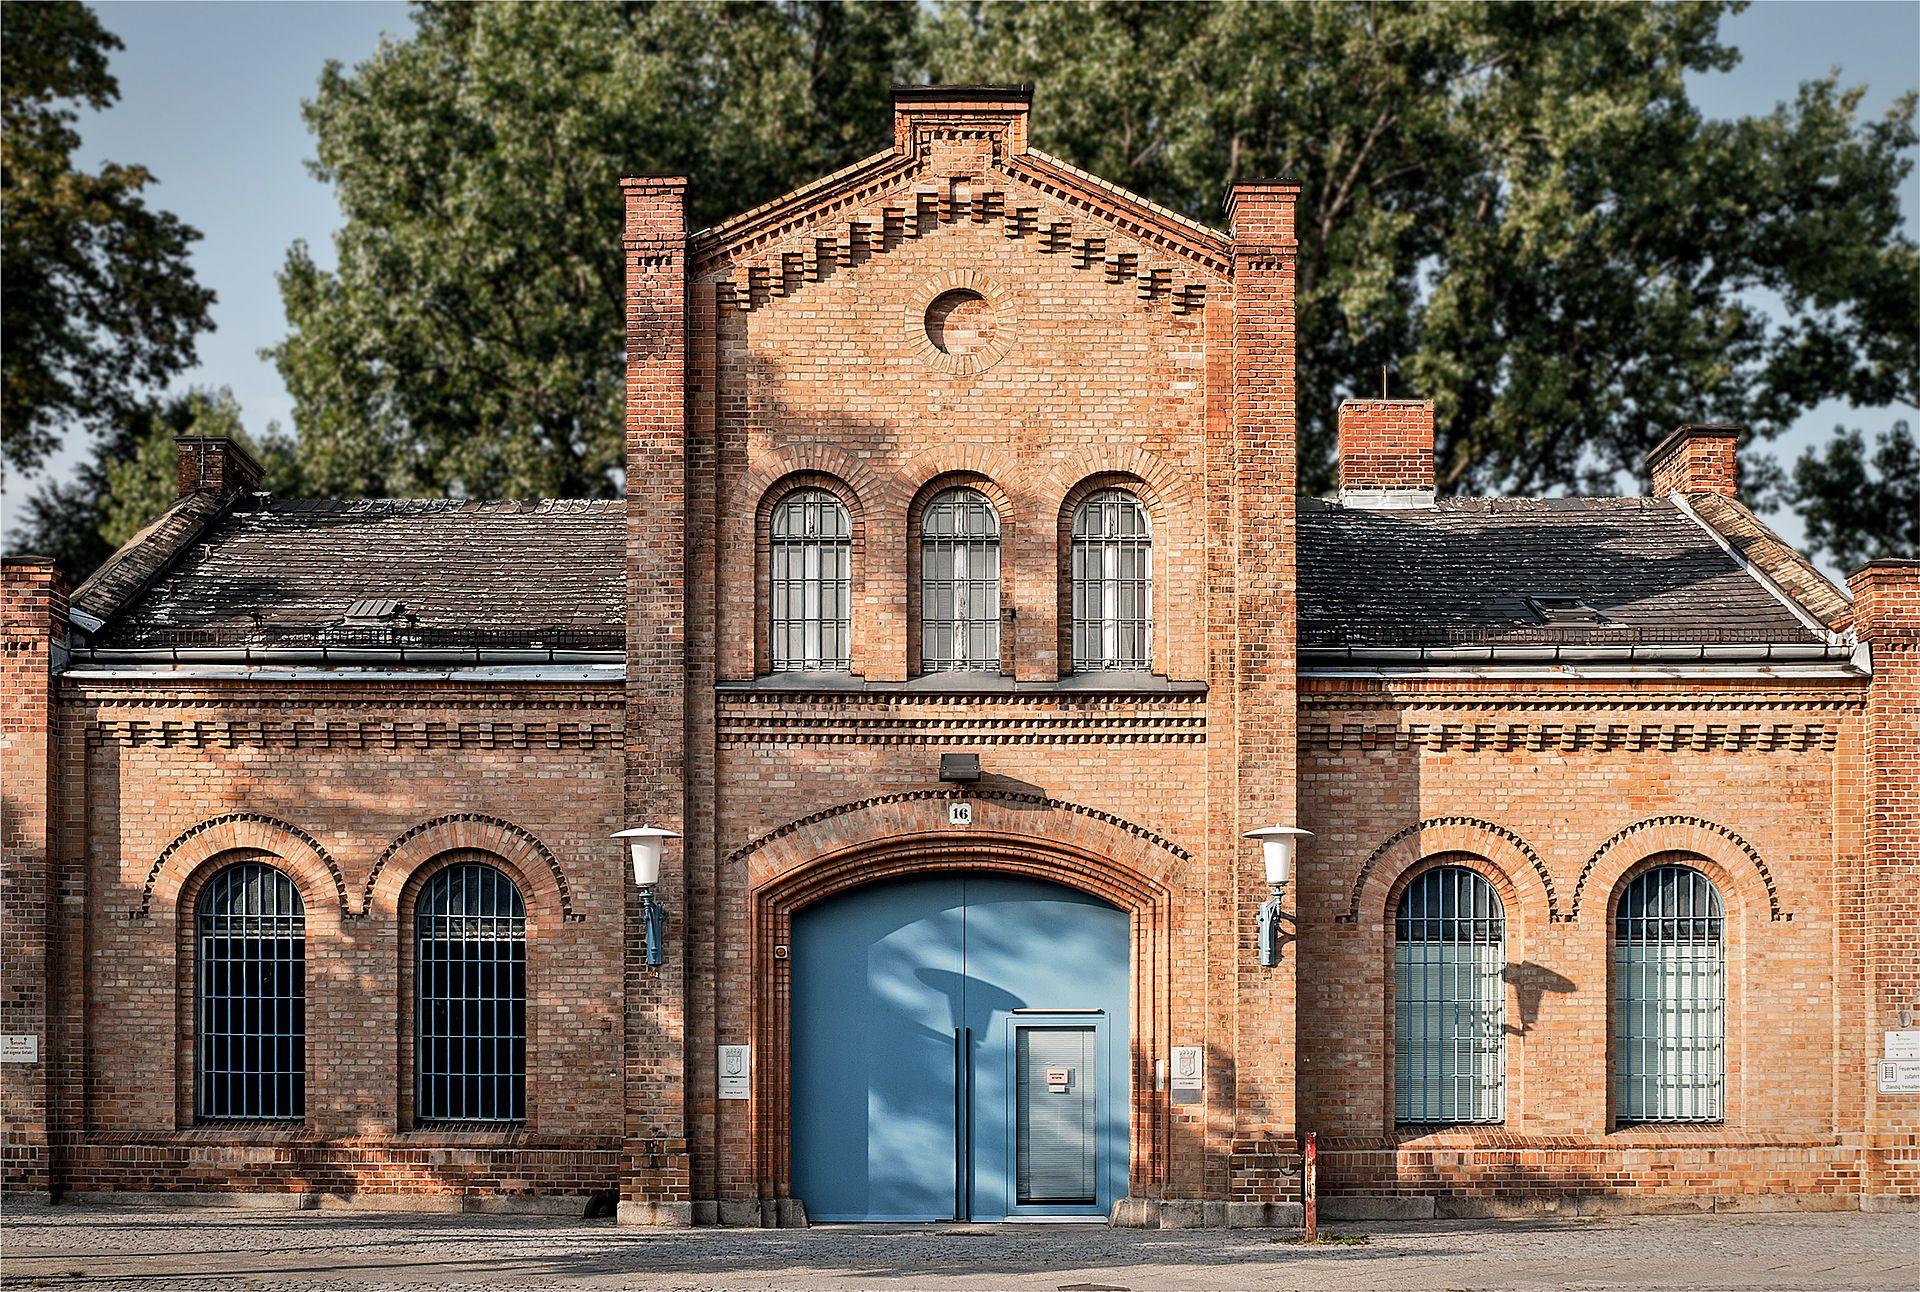 JSA (Jugendstrafanstalt) Plötzensee Pforte - Prison de Plötzensee — Wikipédia